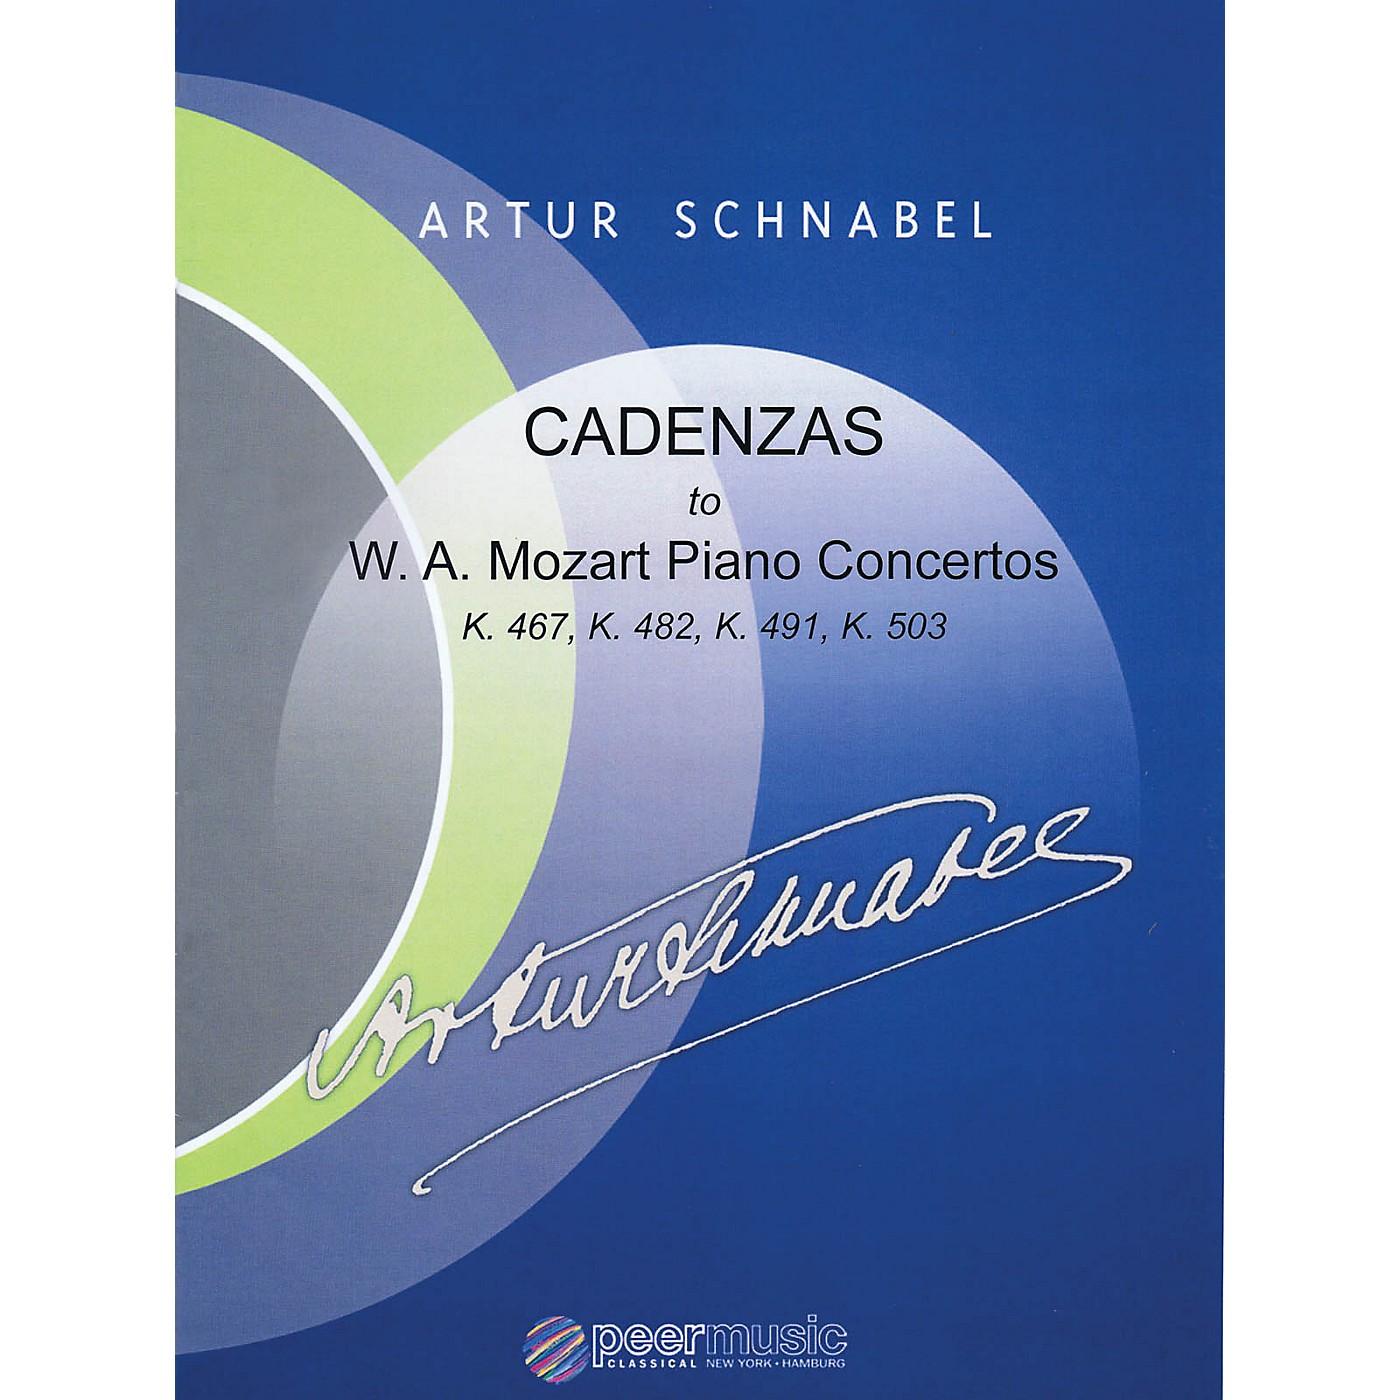 Peer Music Cadenzas to Mozart Piano Concertos, K. 467, K. 482, K. 491, K. 503 Peermusic Classical by Schnabel thumbnail